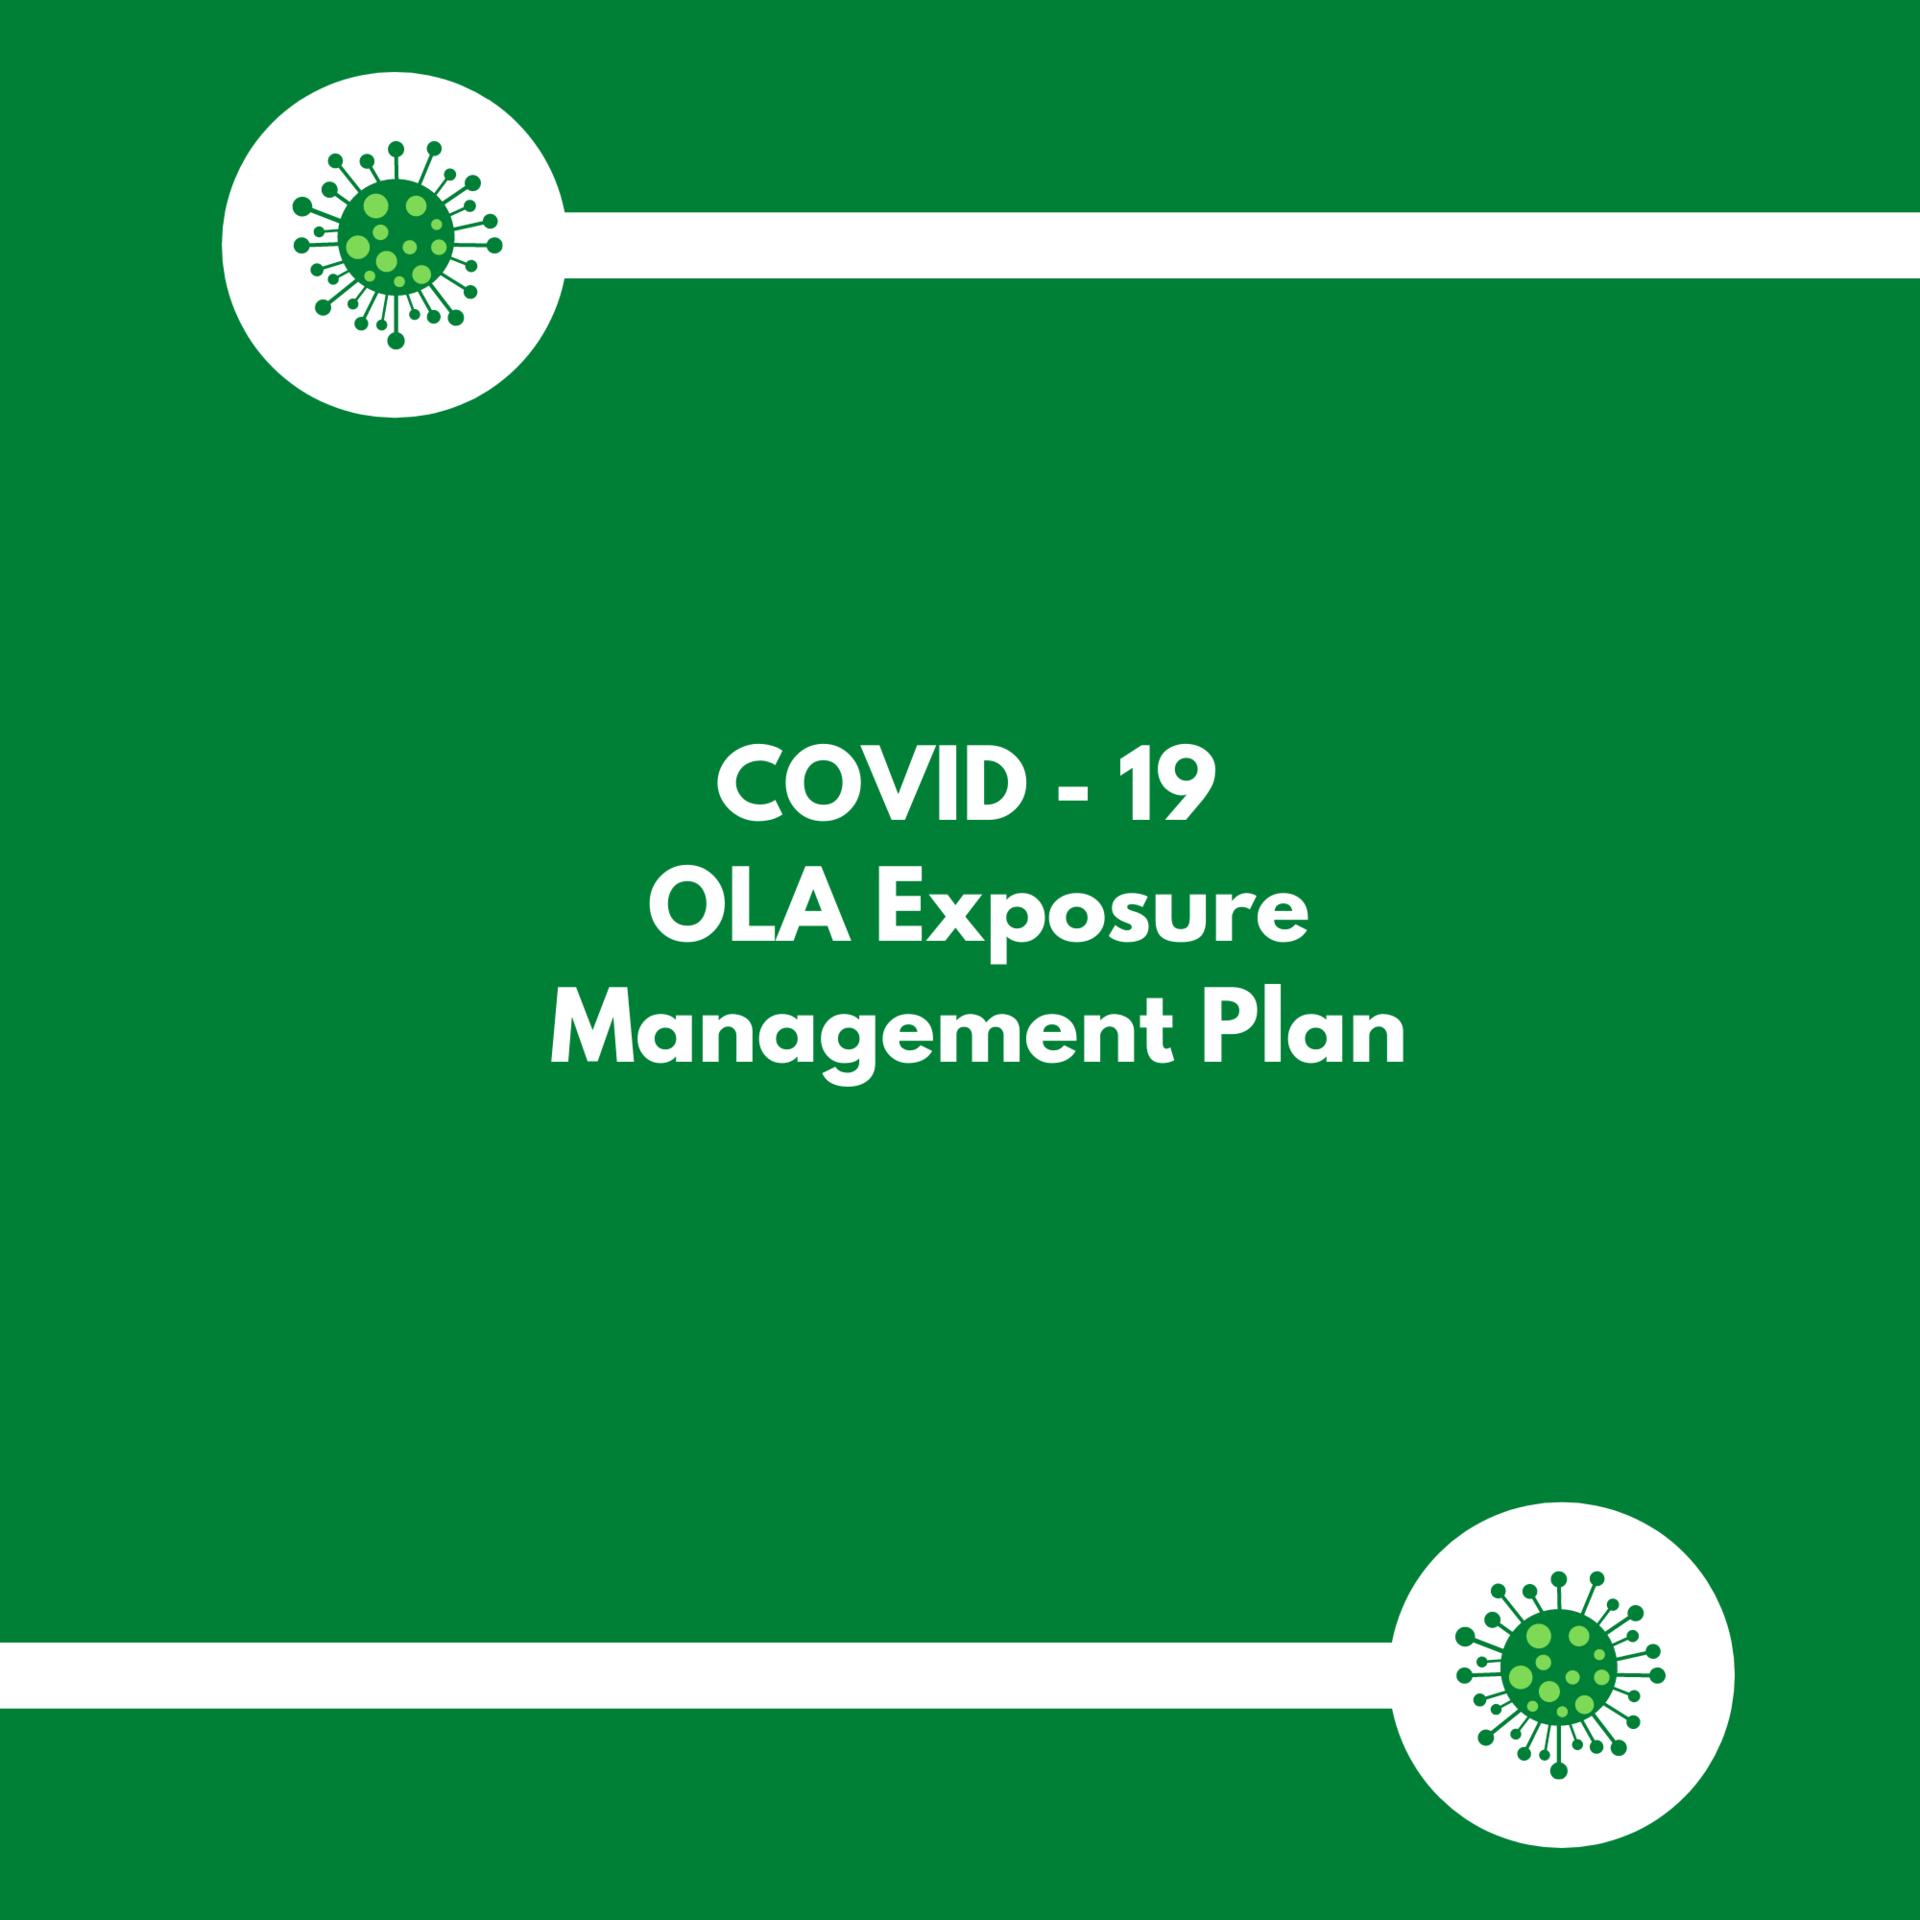 OLA Management Plan